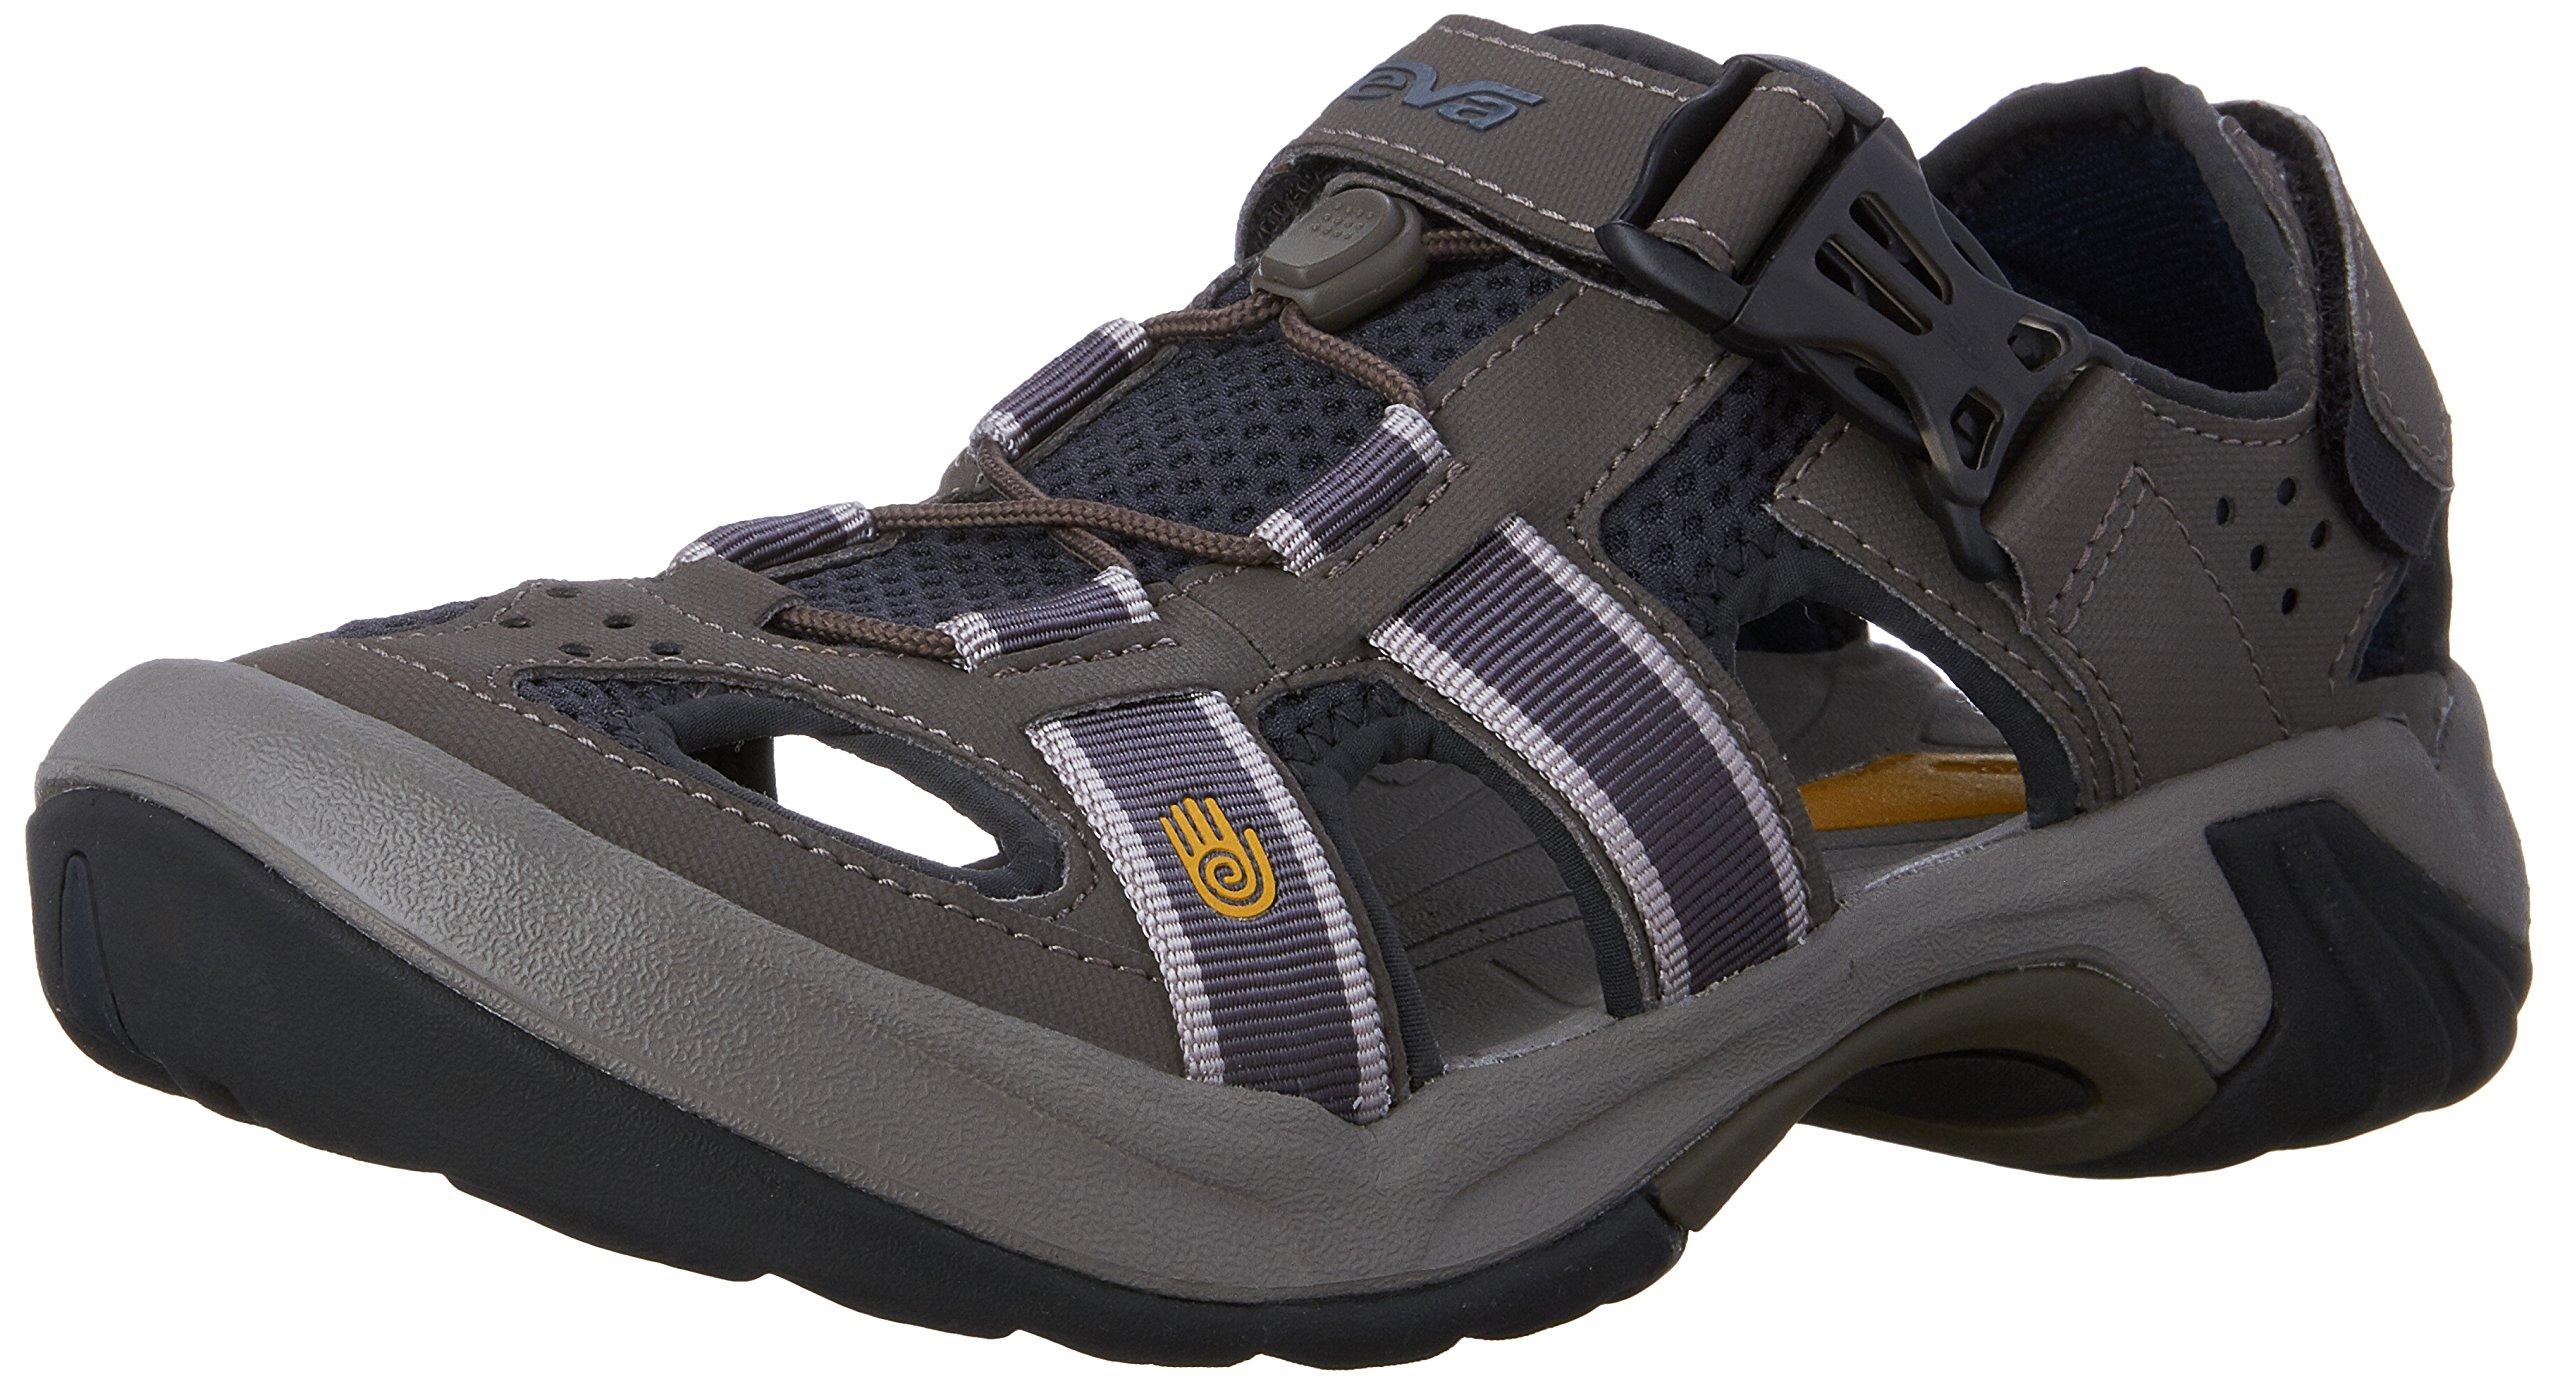 Teva Men S Omnium Closed Toe Sandal Ombre Blue 7 M Us Amazon